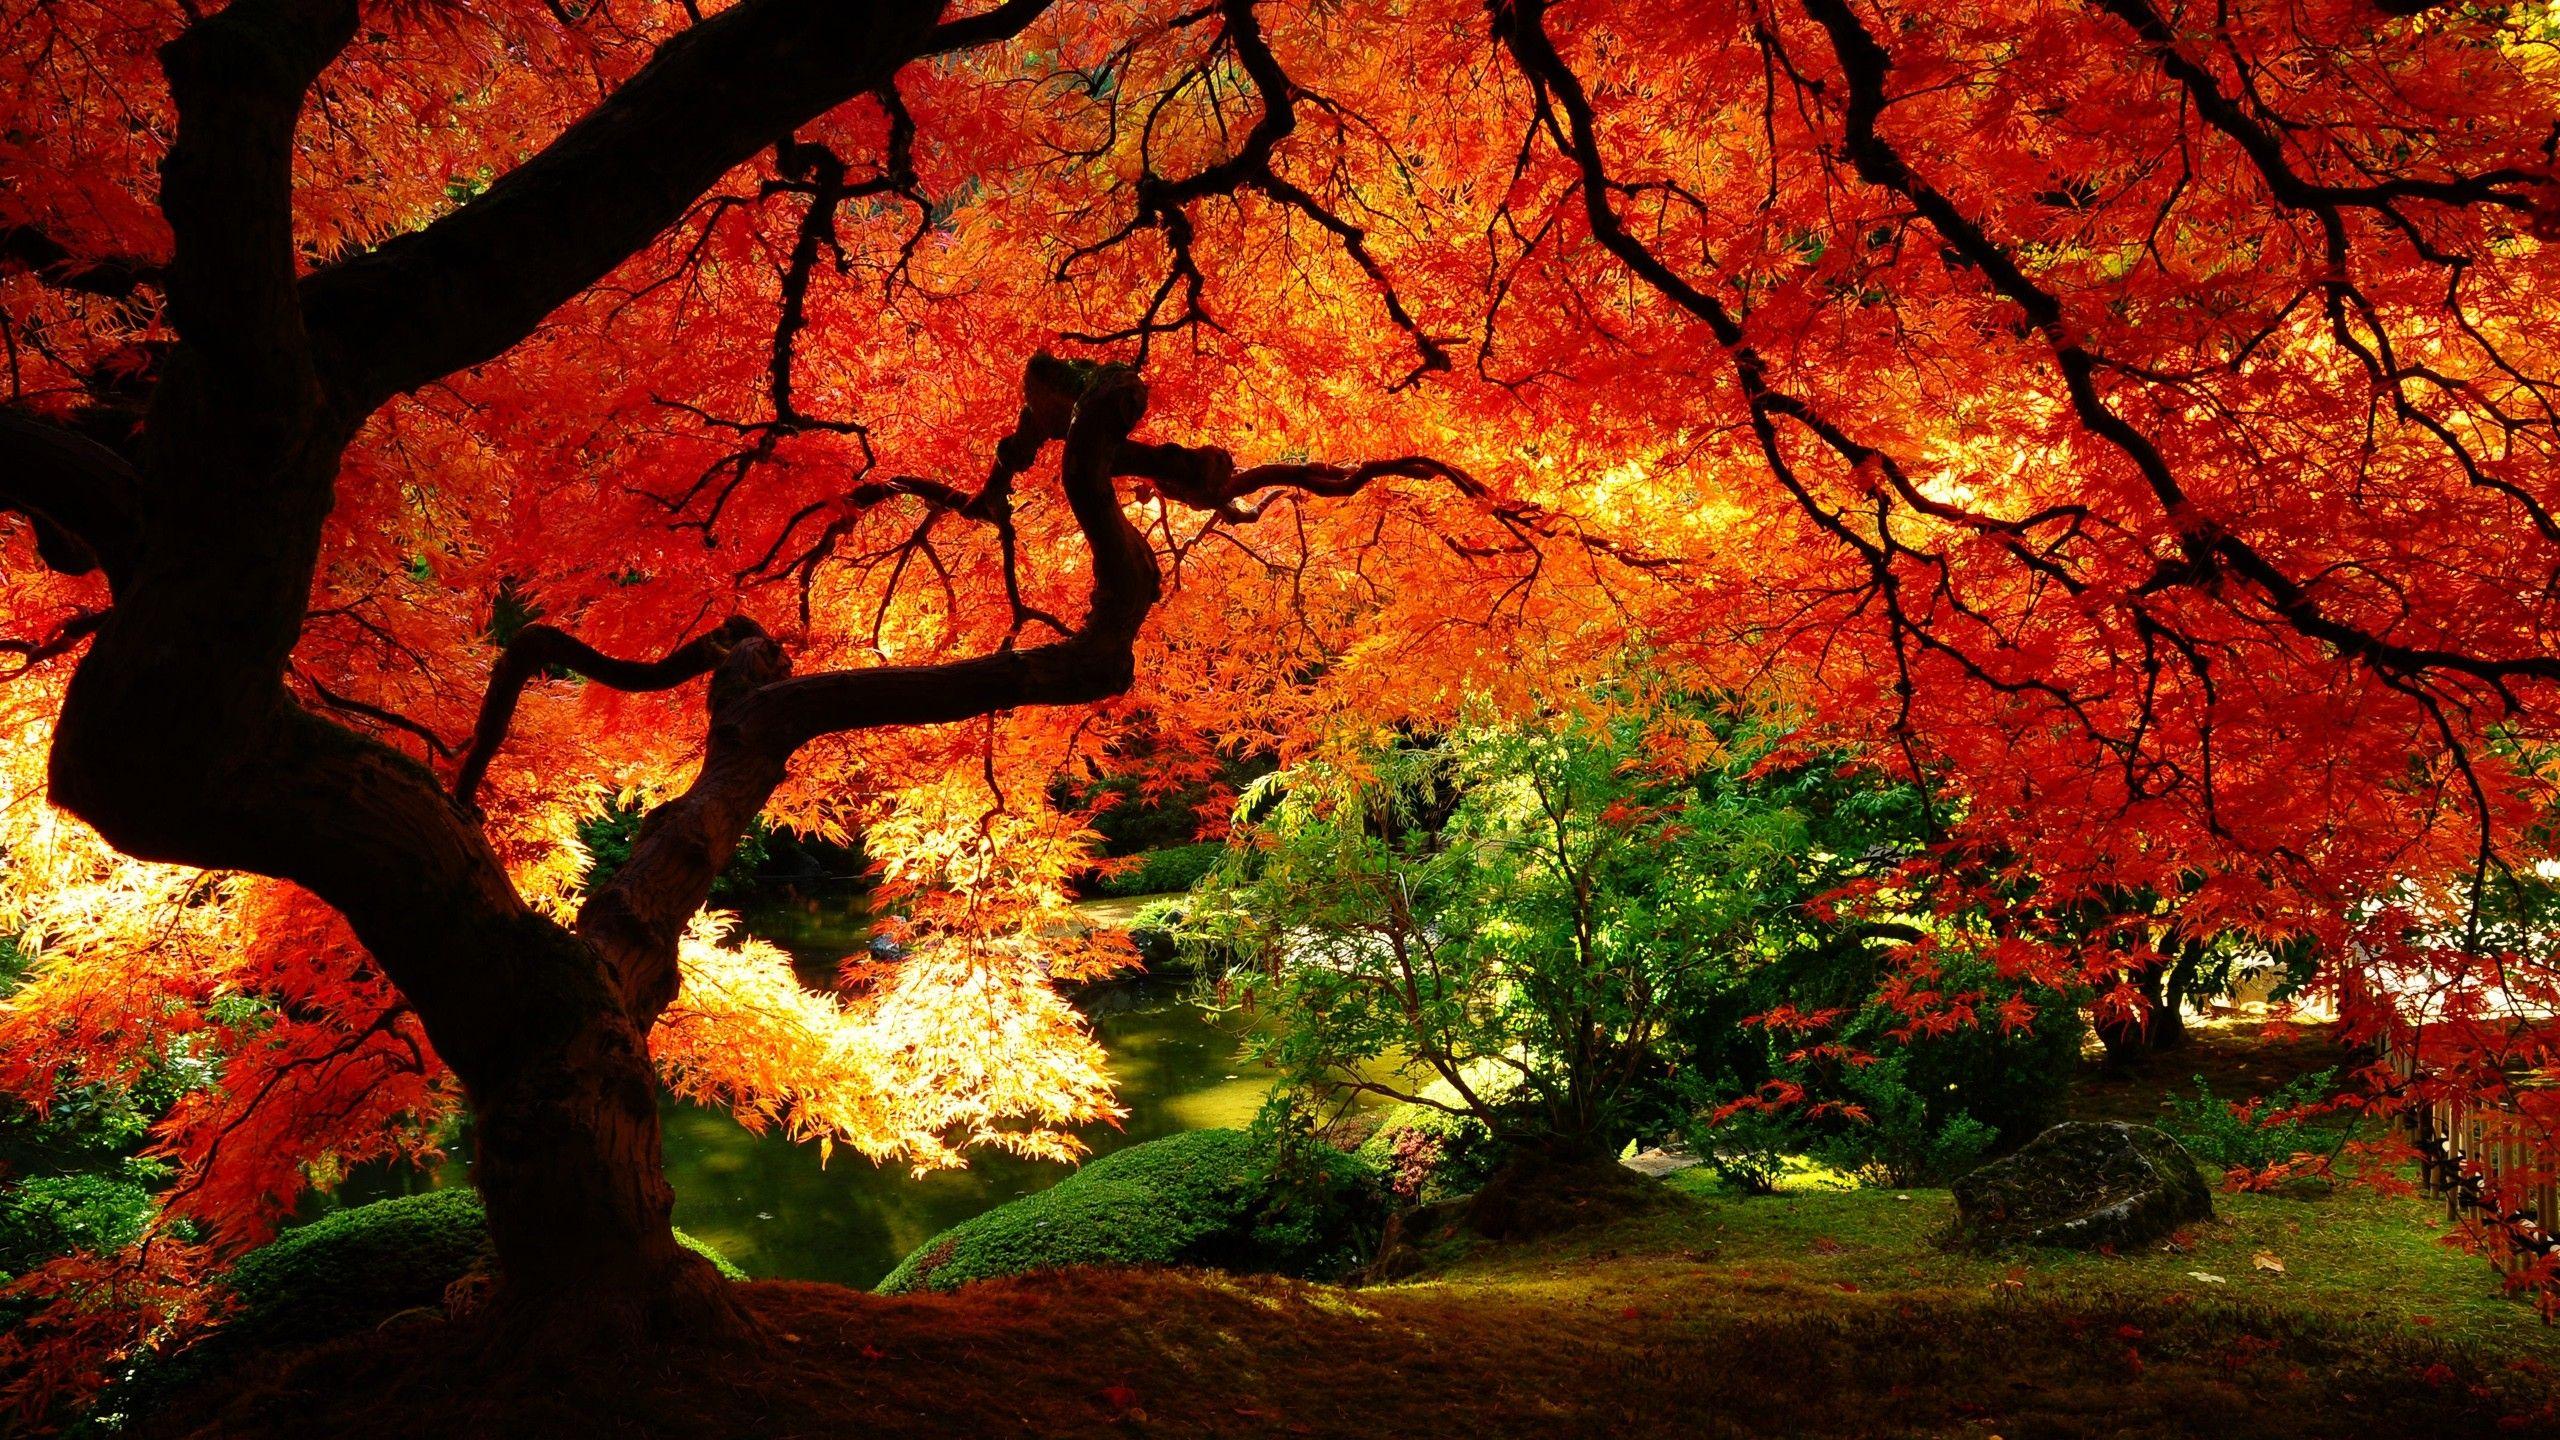 Fall Colors Desktop Wallpaper Japanese Tea Garden Wallpapers Iphone With Wallpaper High